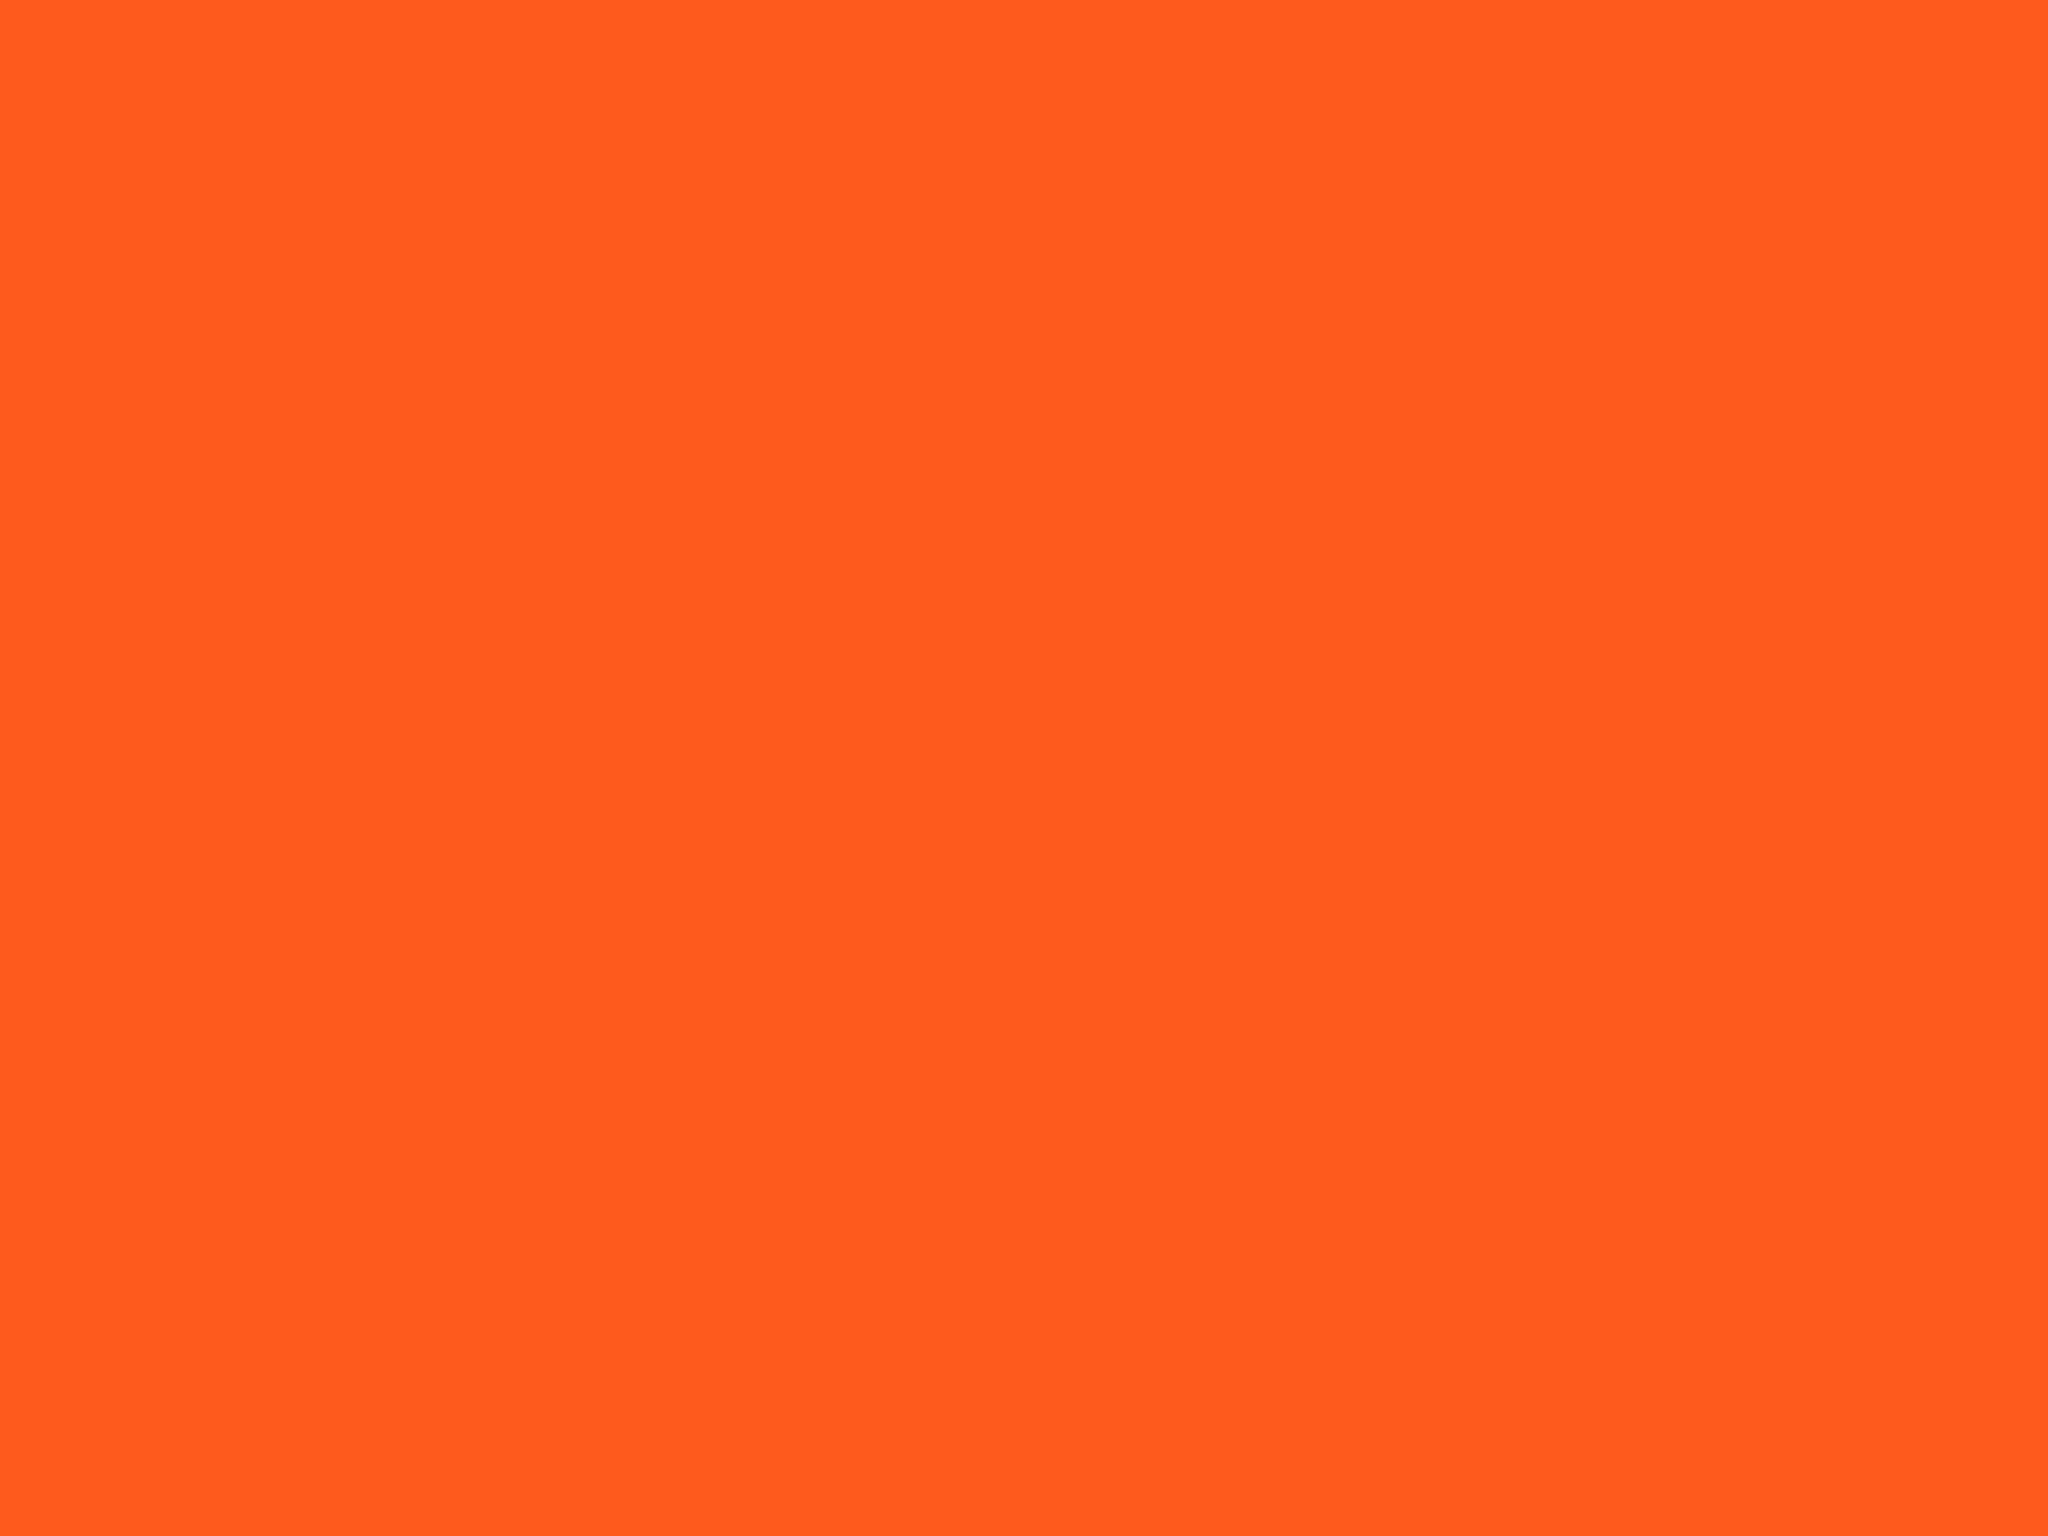 2048x1536 Giants Orange Solid Color Background